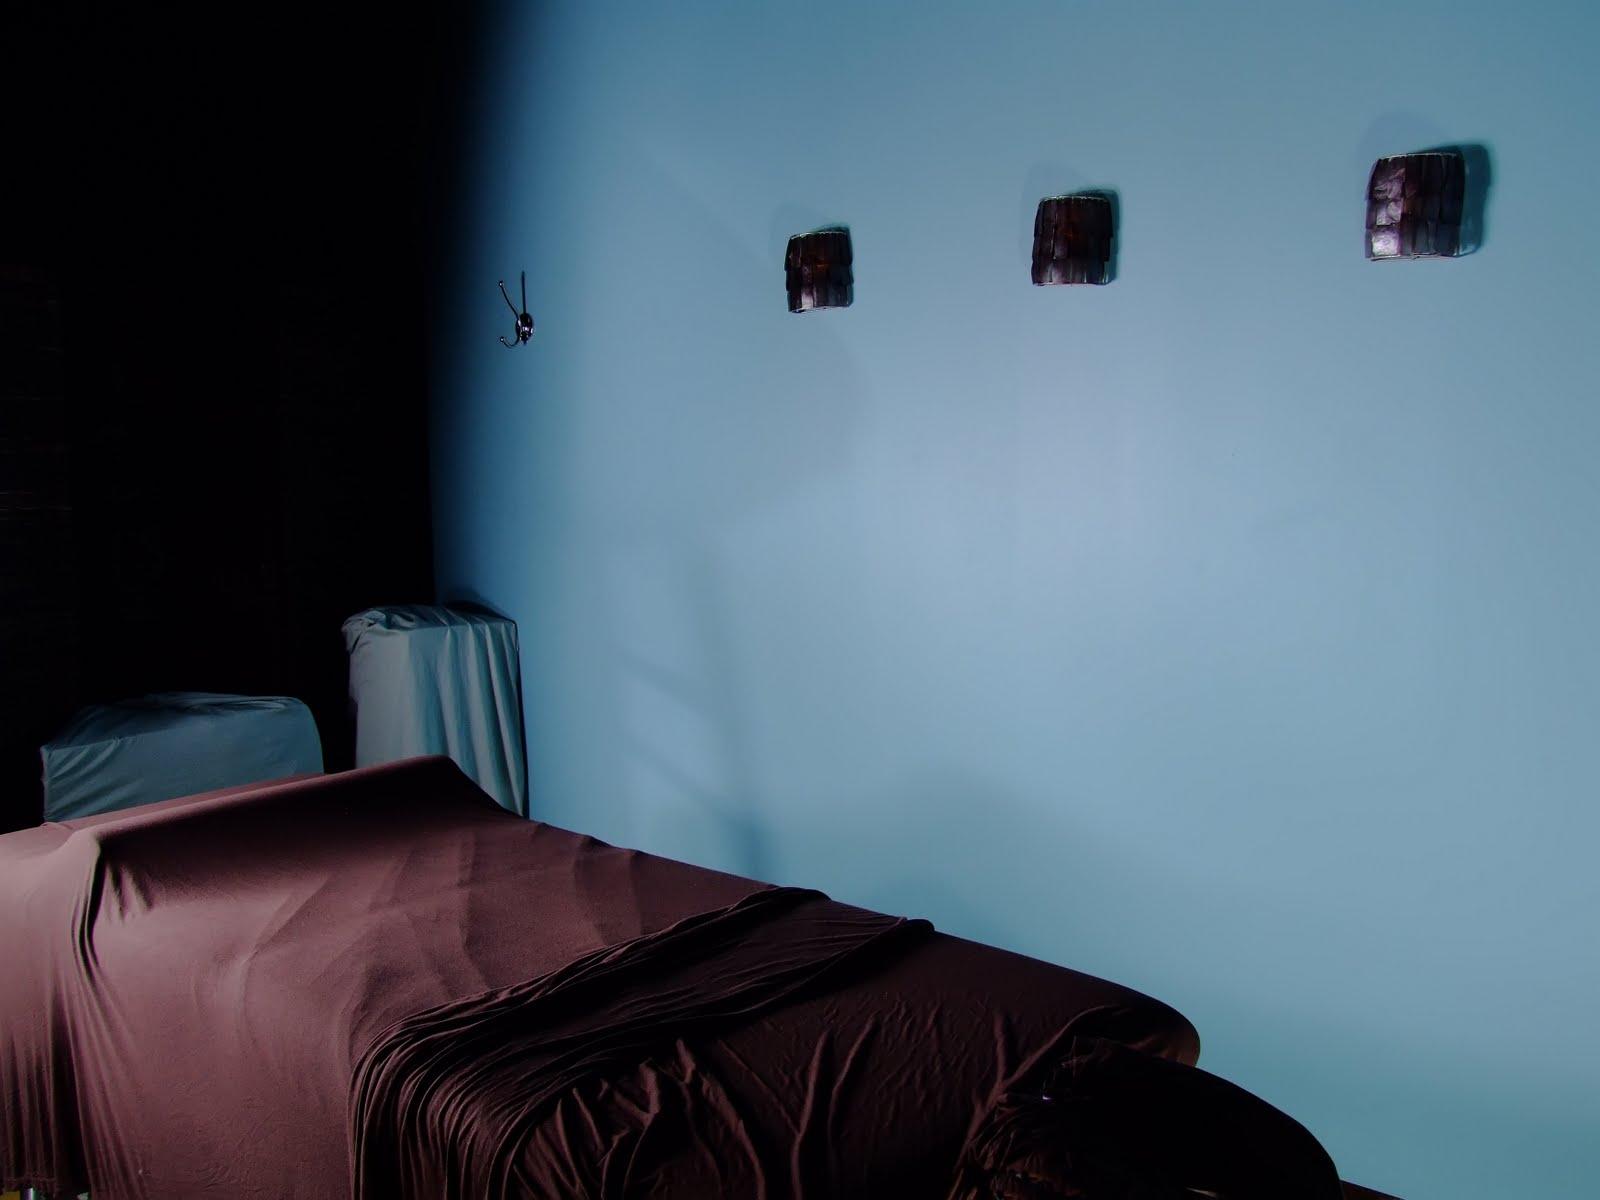 http://2.bp.blogspot.com/-6kCgSpW4eaM/TlvtGe3ckTI/AAAAAAAADfk/yC6Q5W7WLKE/s1600/massage%2Broom.JPG